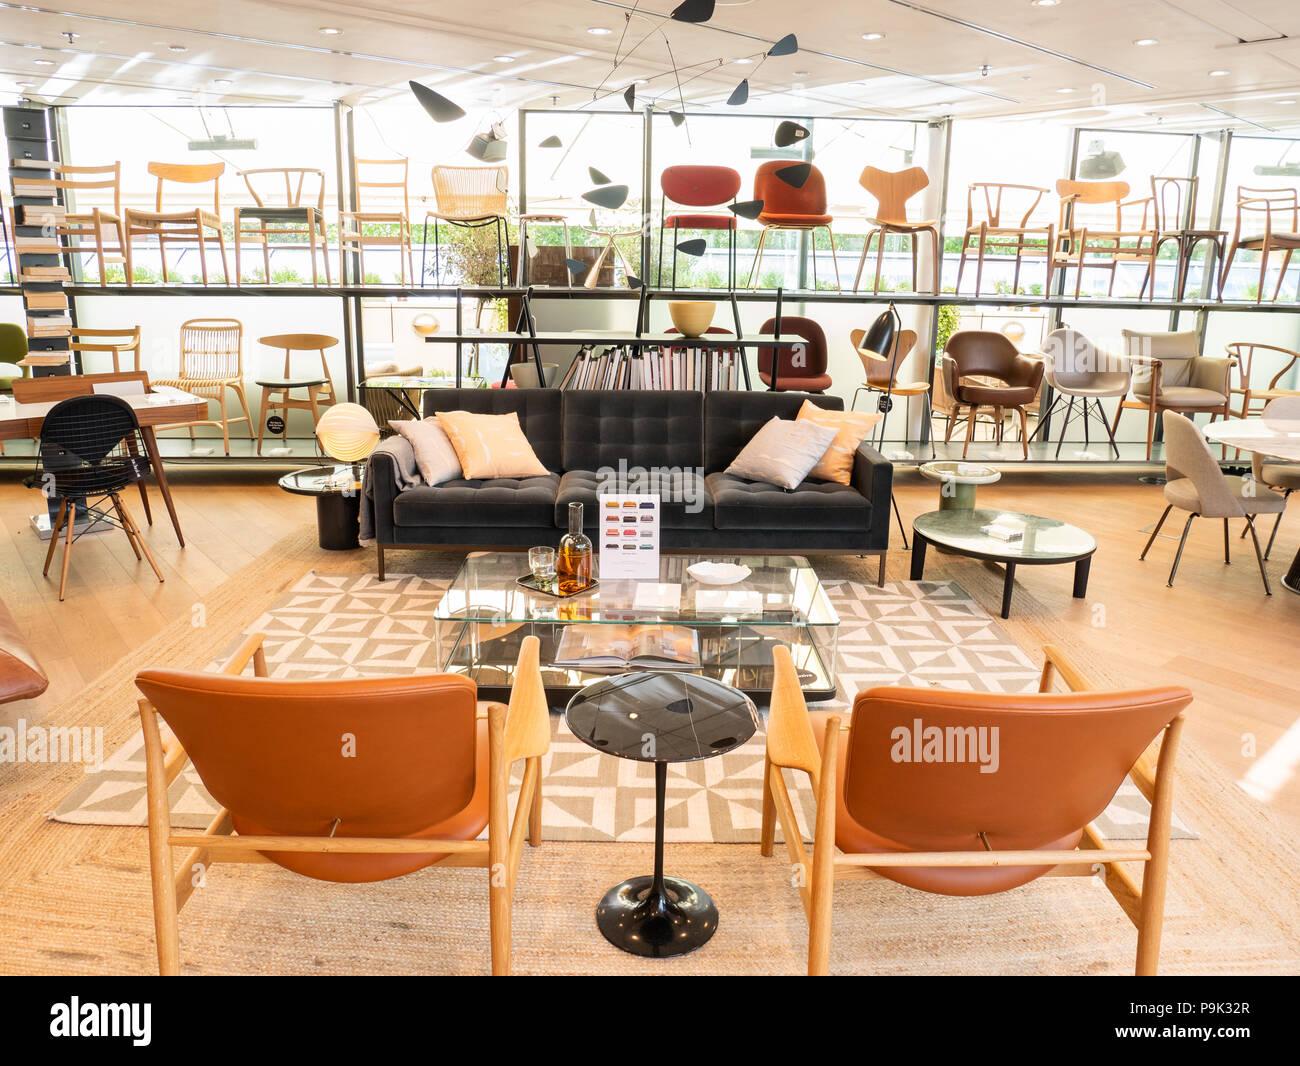 The Conran Shop, Marylebone, London, UK - Stock Image